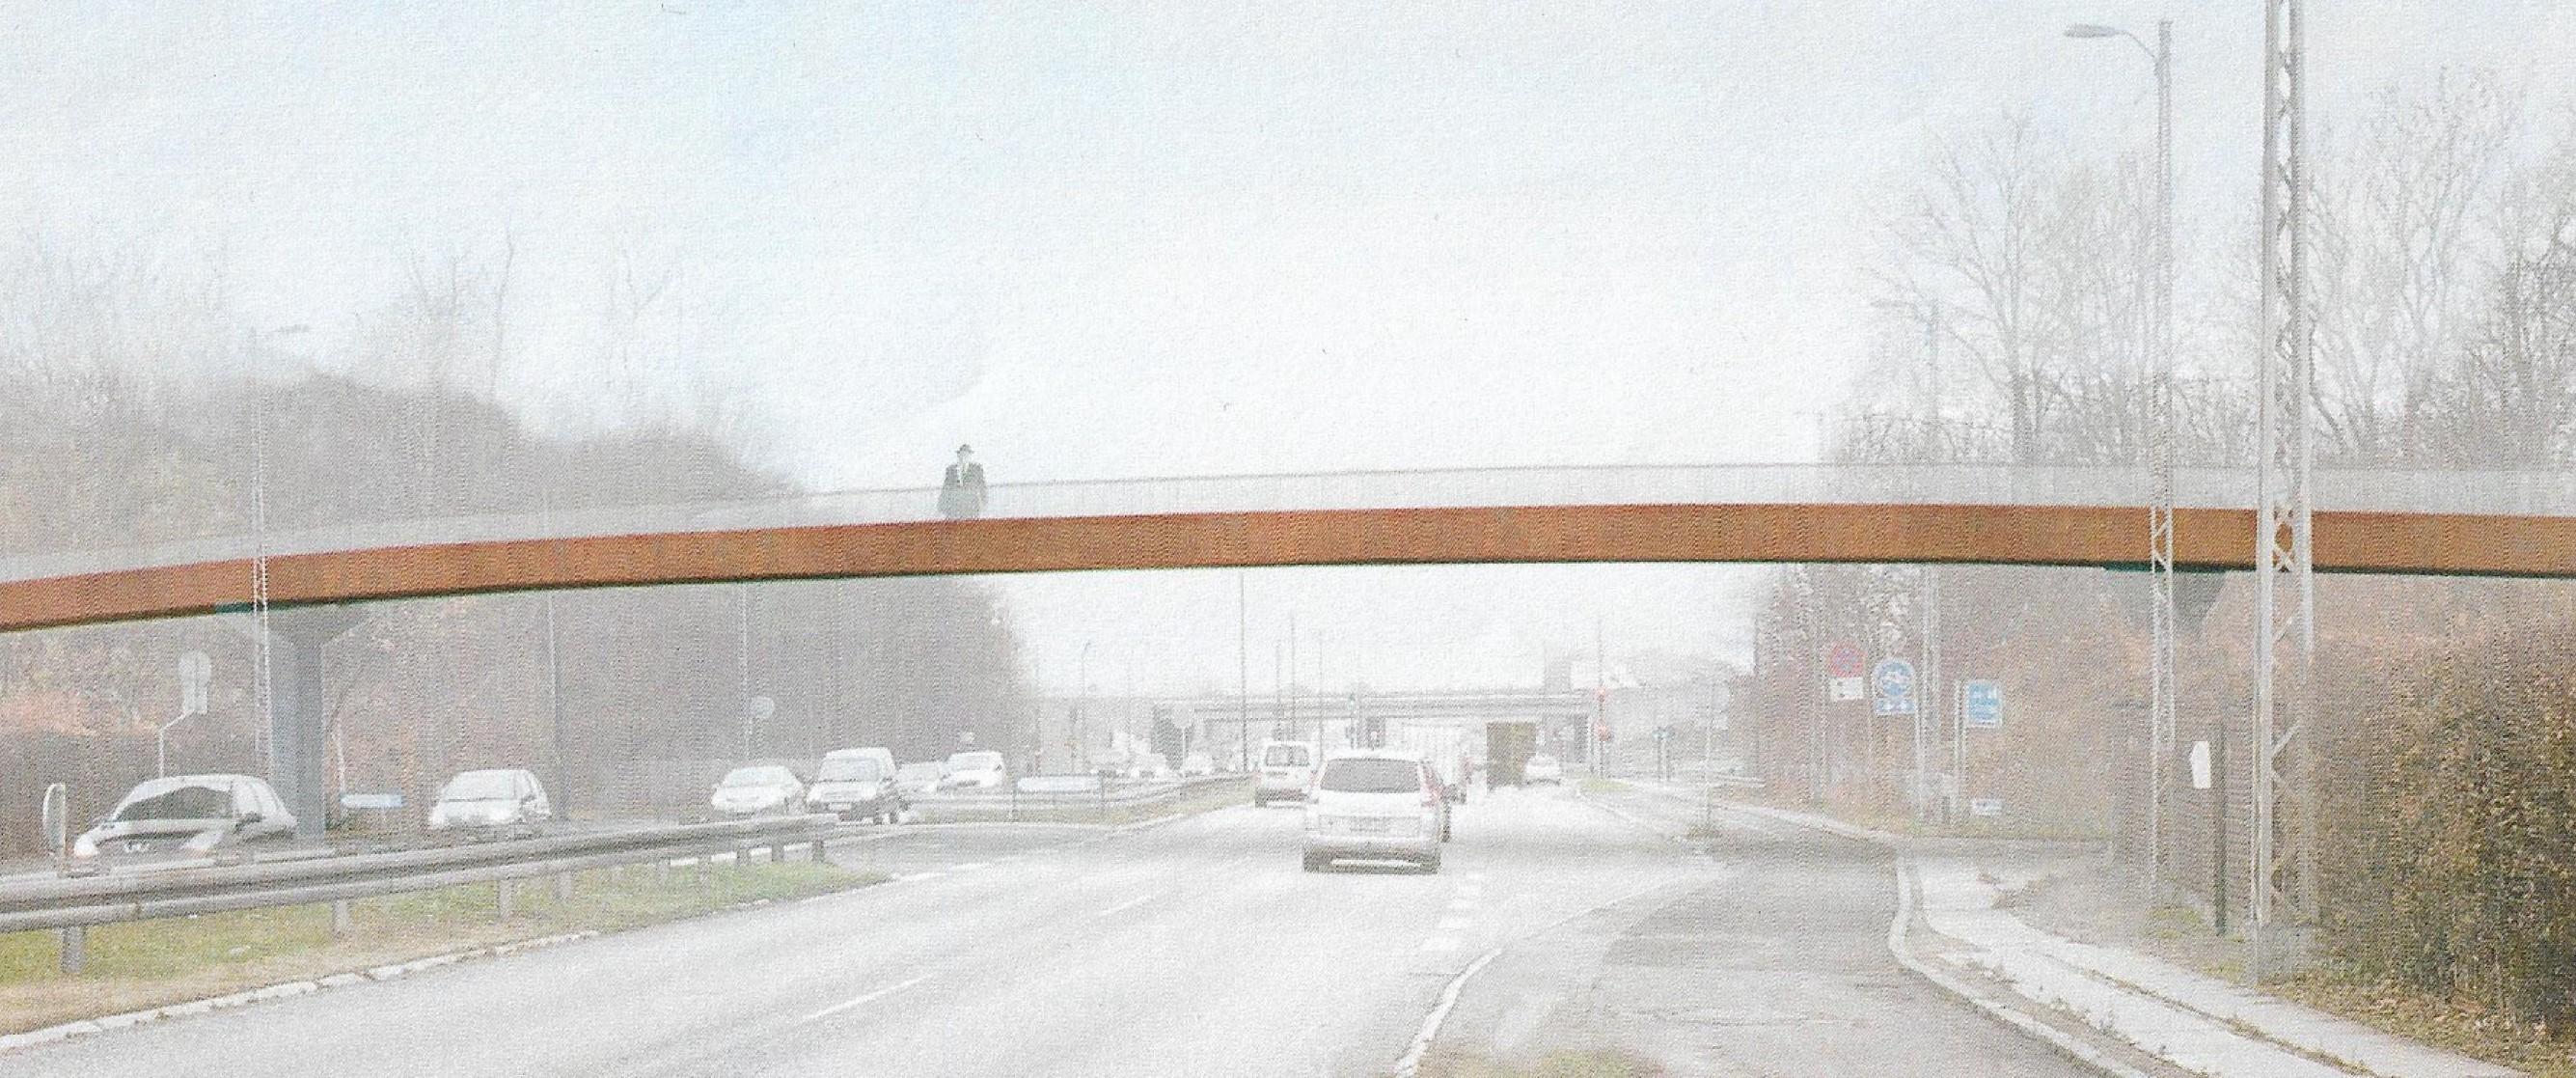 Ny bro over Jyllingevej